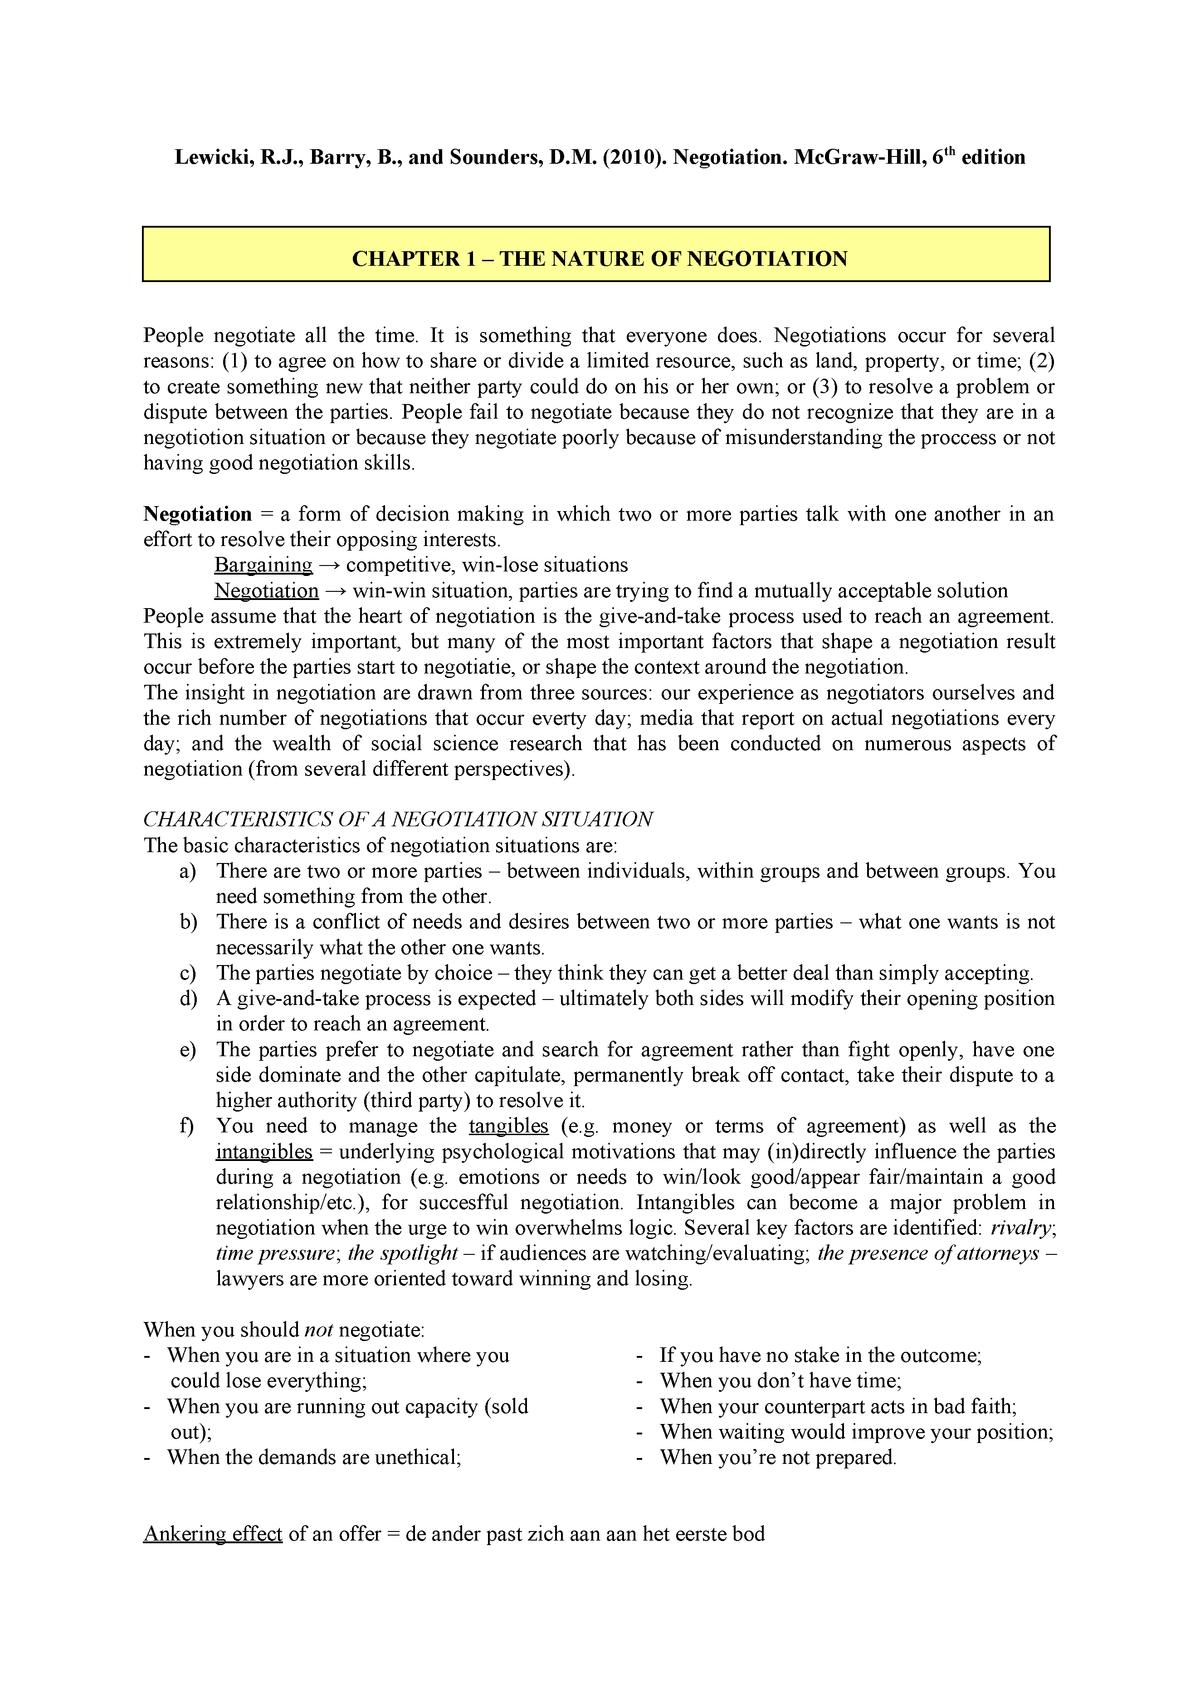 Essentials Of Negotiation 6th Edition Pdf Download